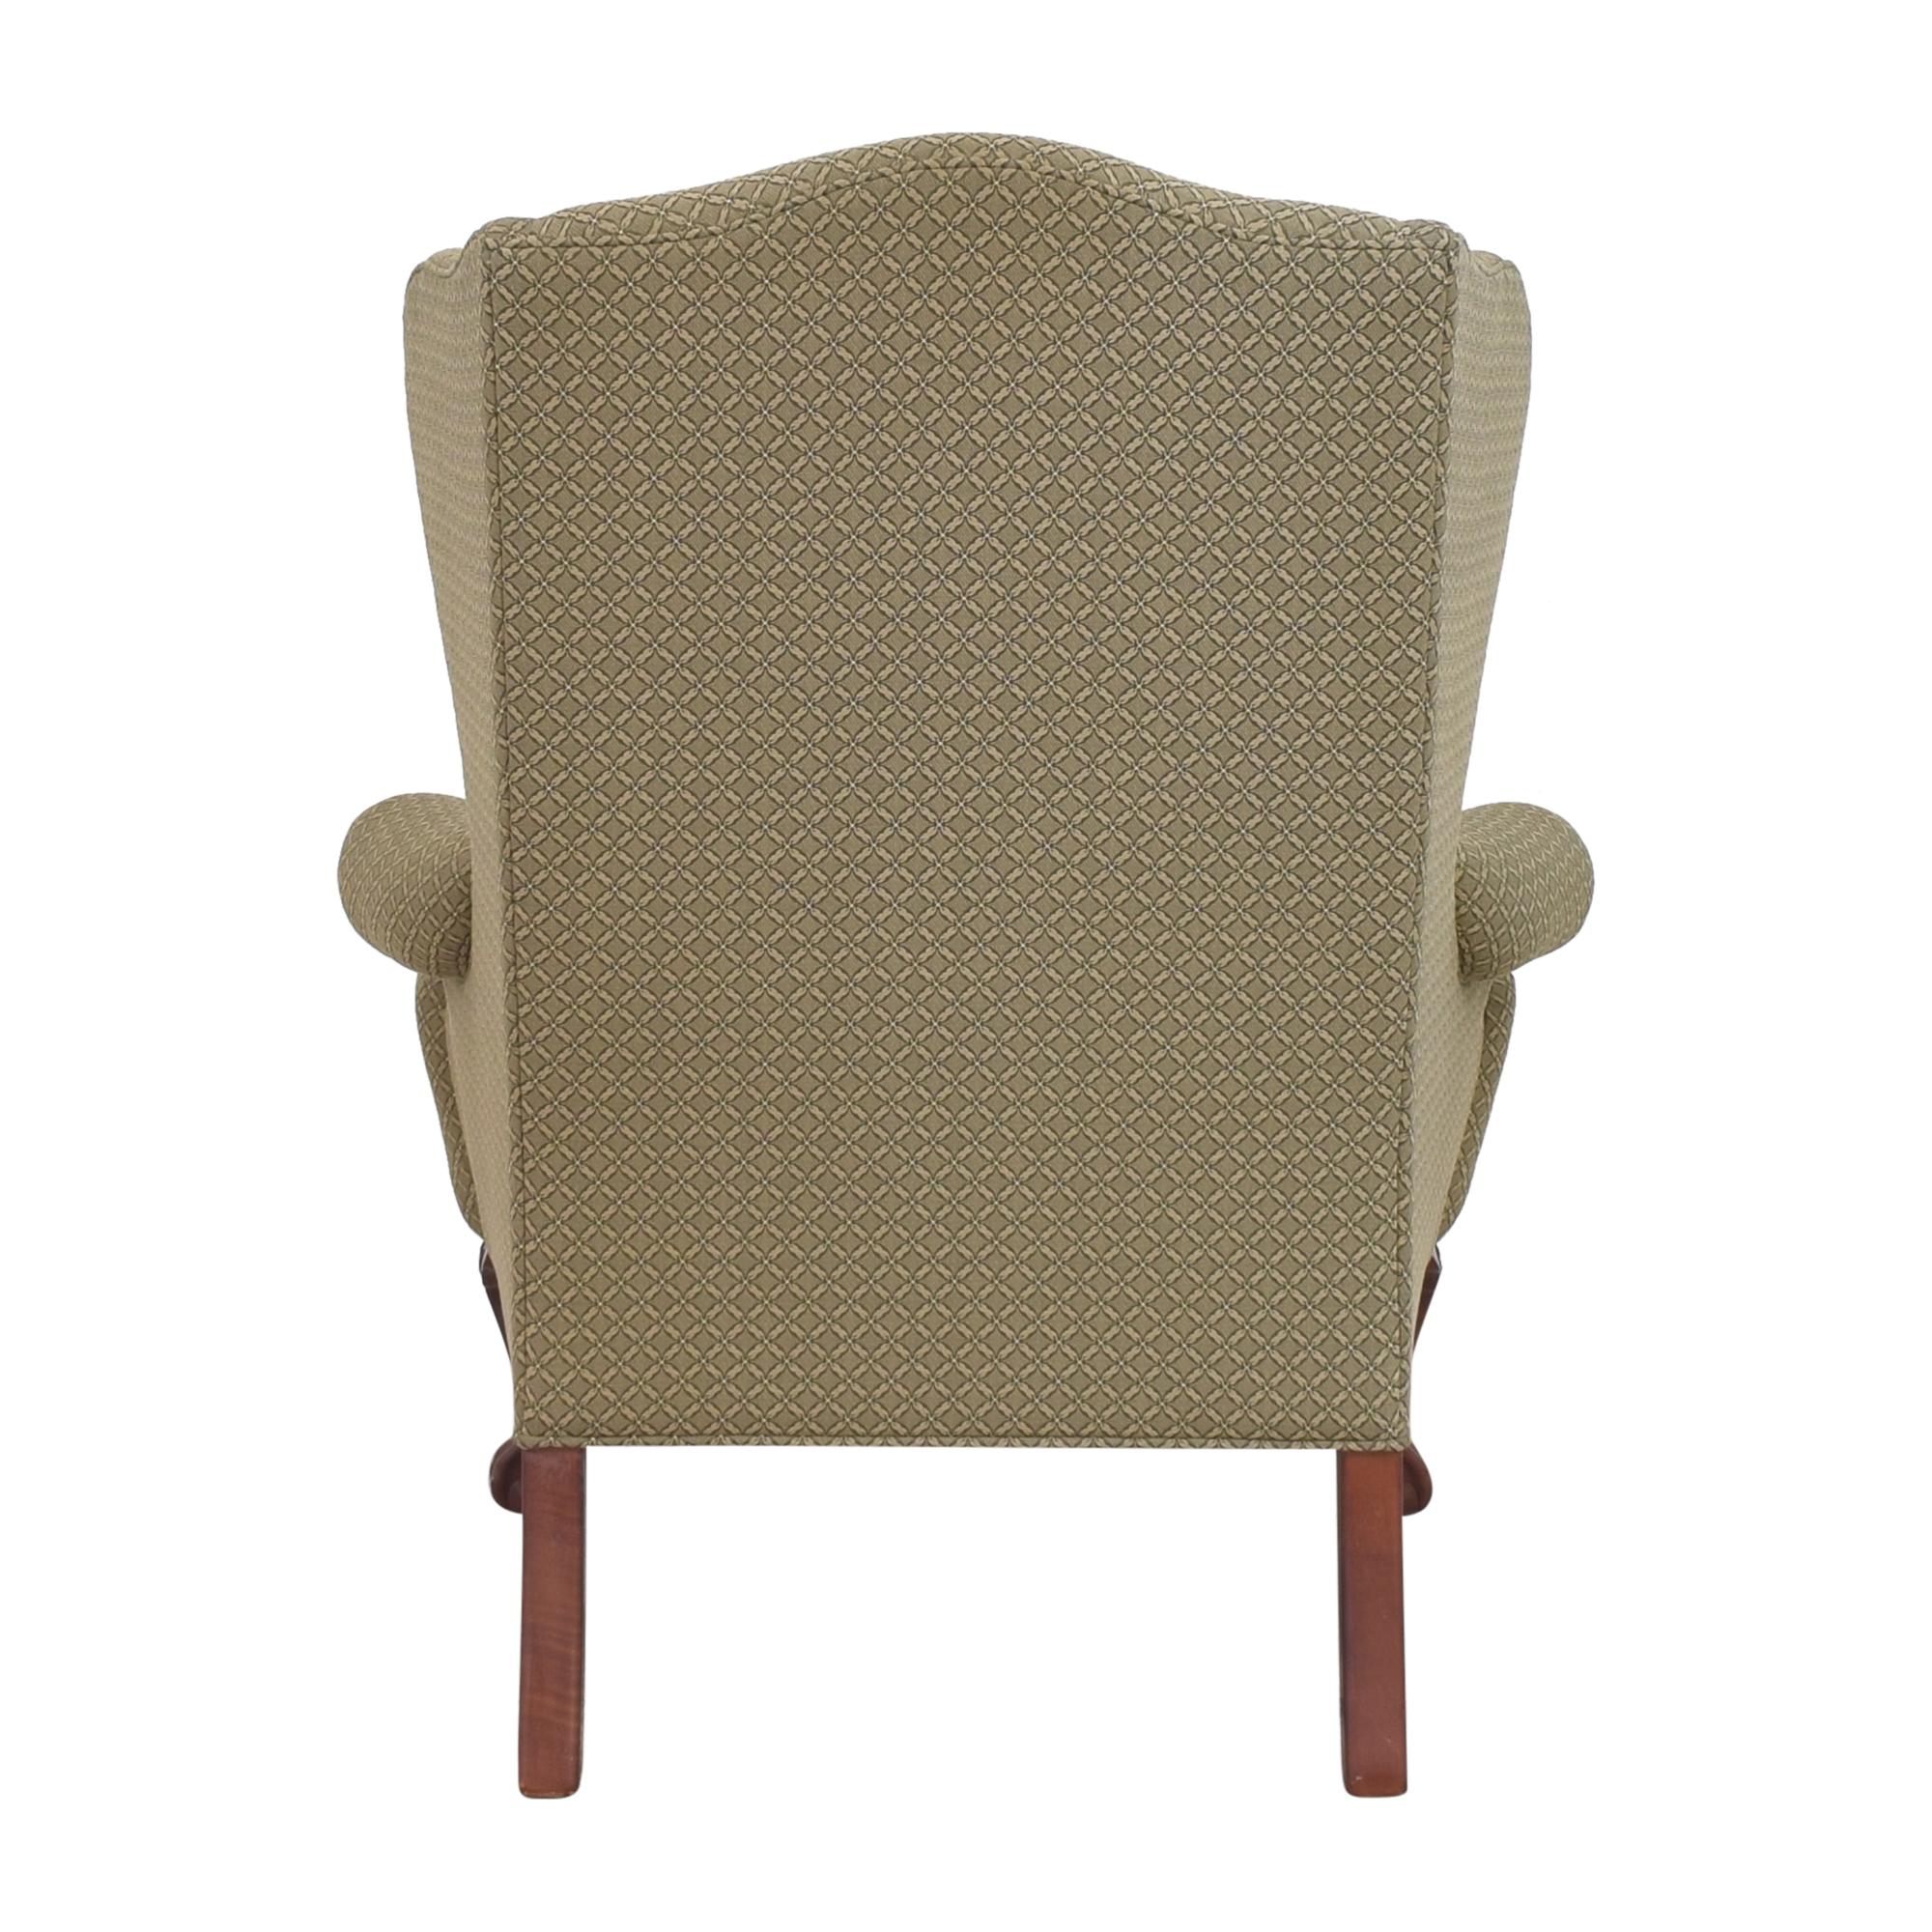 Ethan Allen Ethan Allen Giles Chair ct